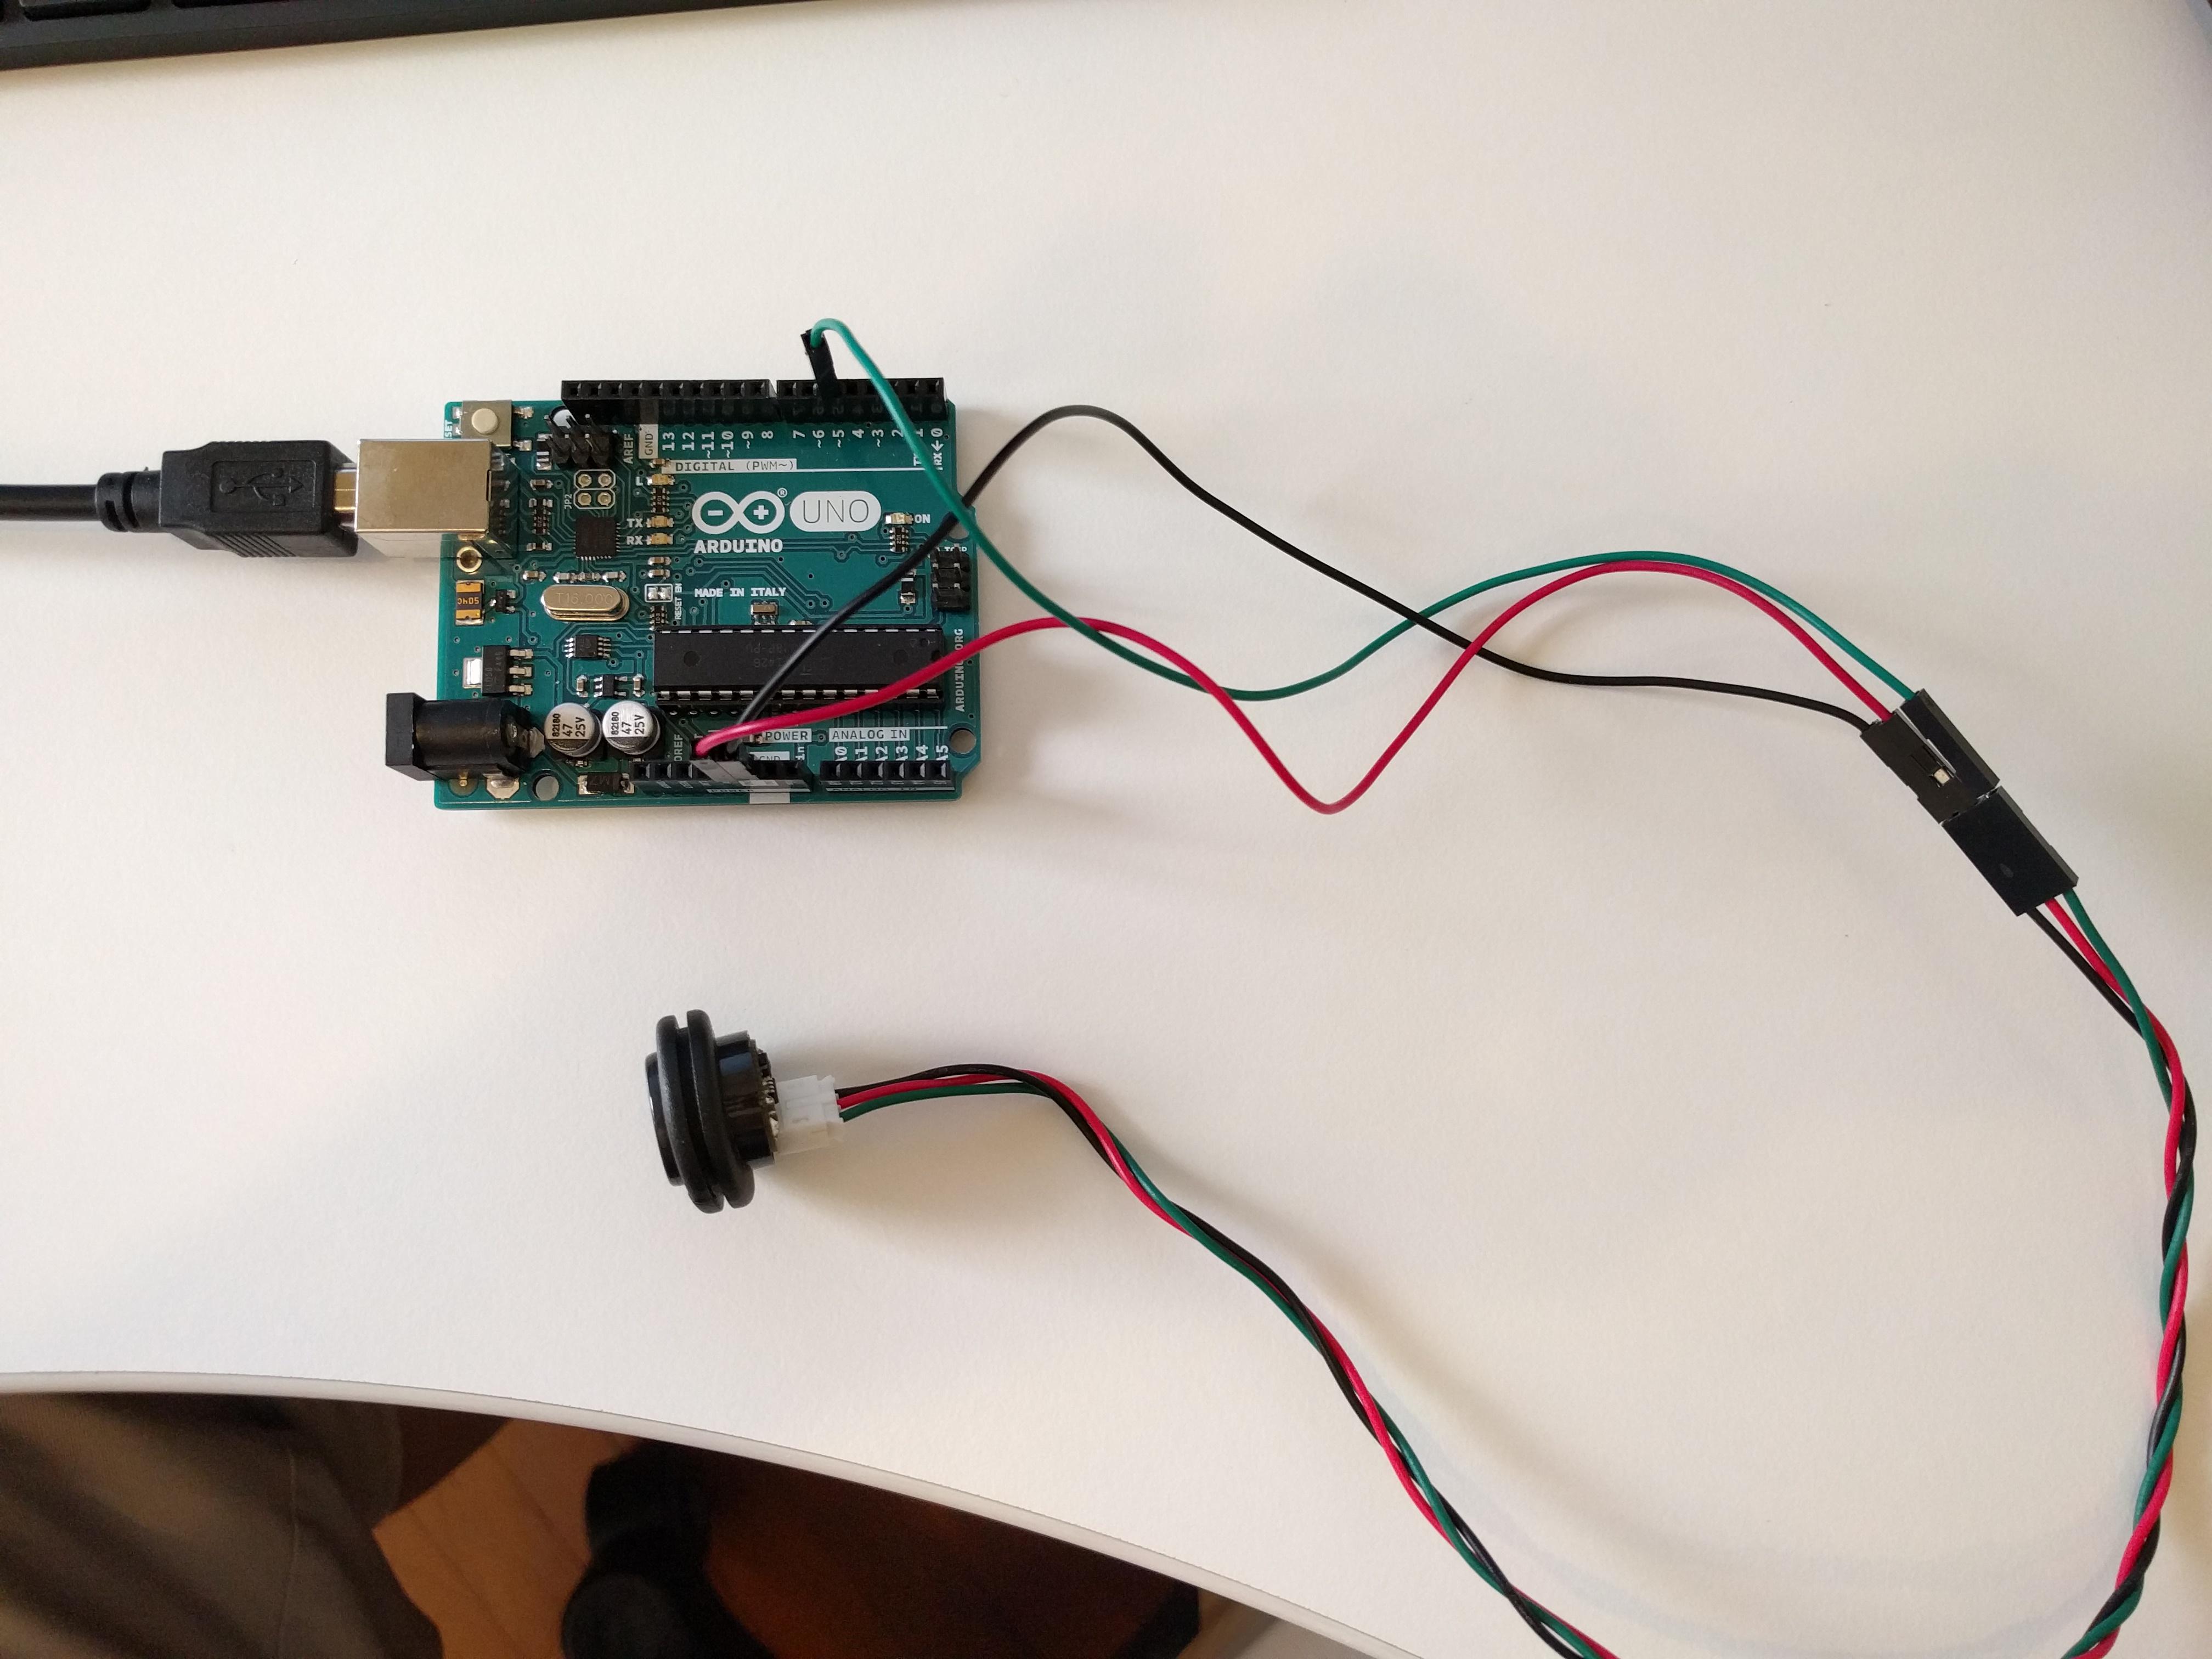 SRF01_Ultrasonic_sensor__SKU_SEN0004_-DFRobot